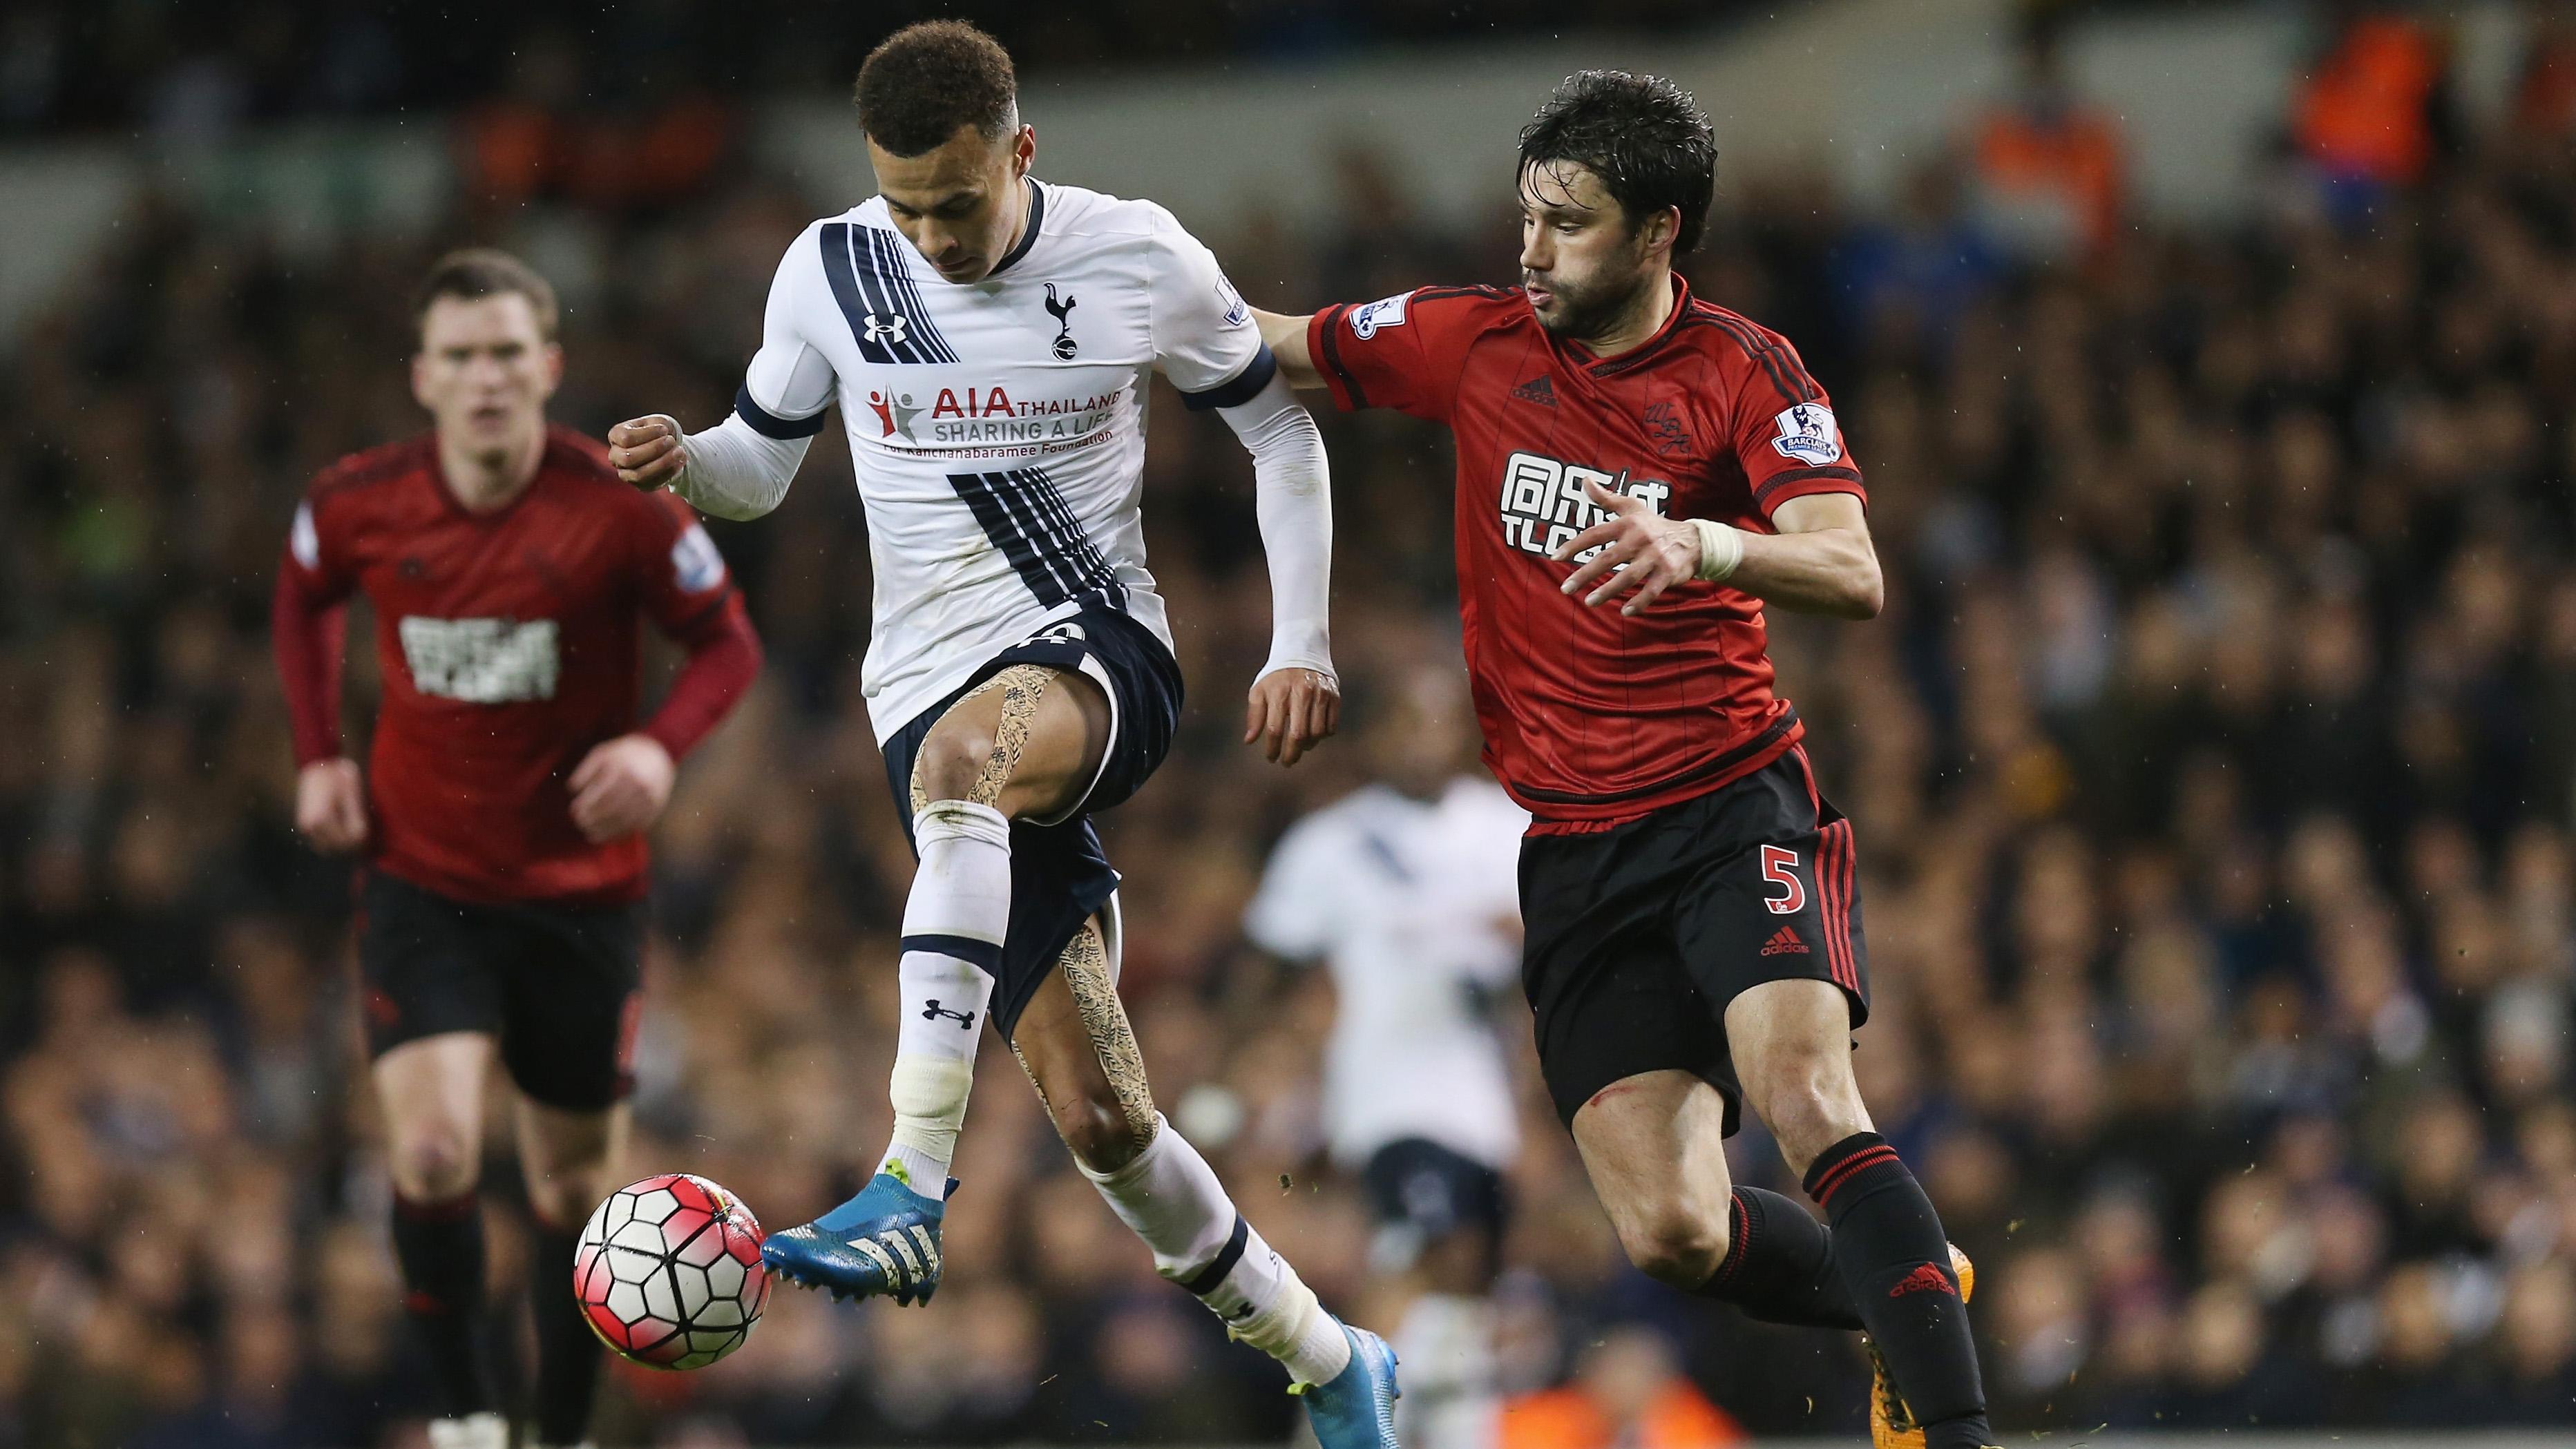 Tottenham Dele Alli suspended for punching Claudio Yacob